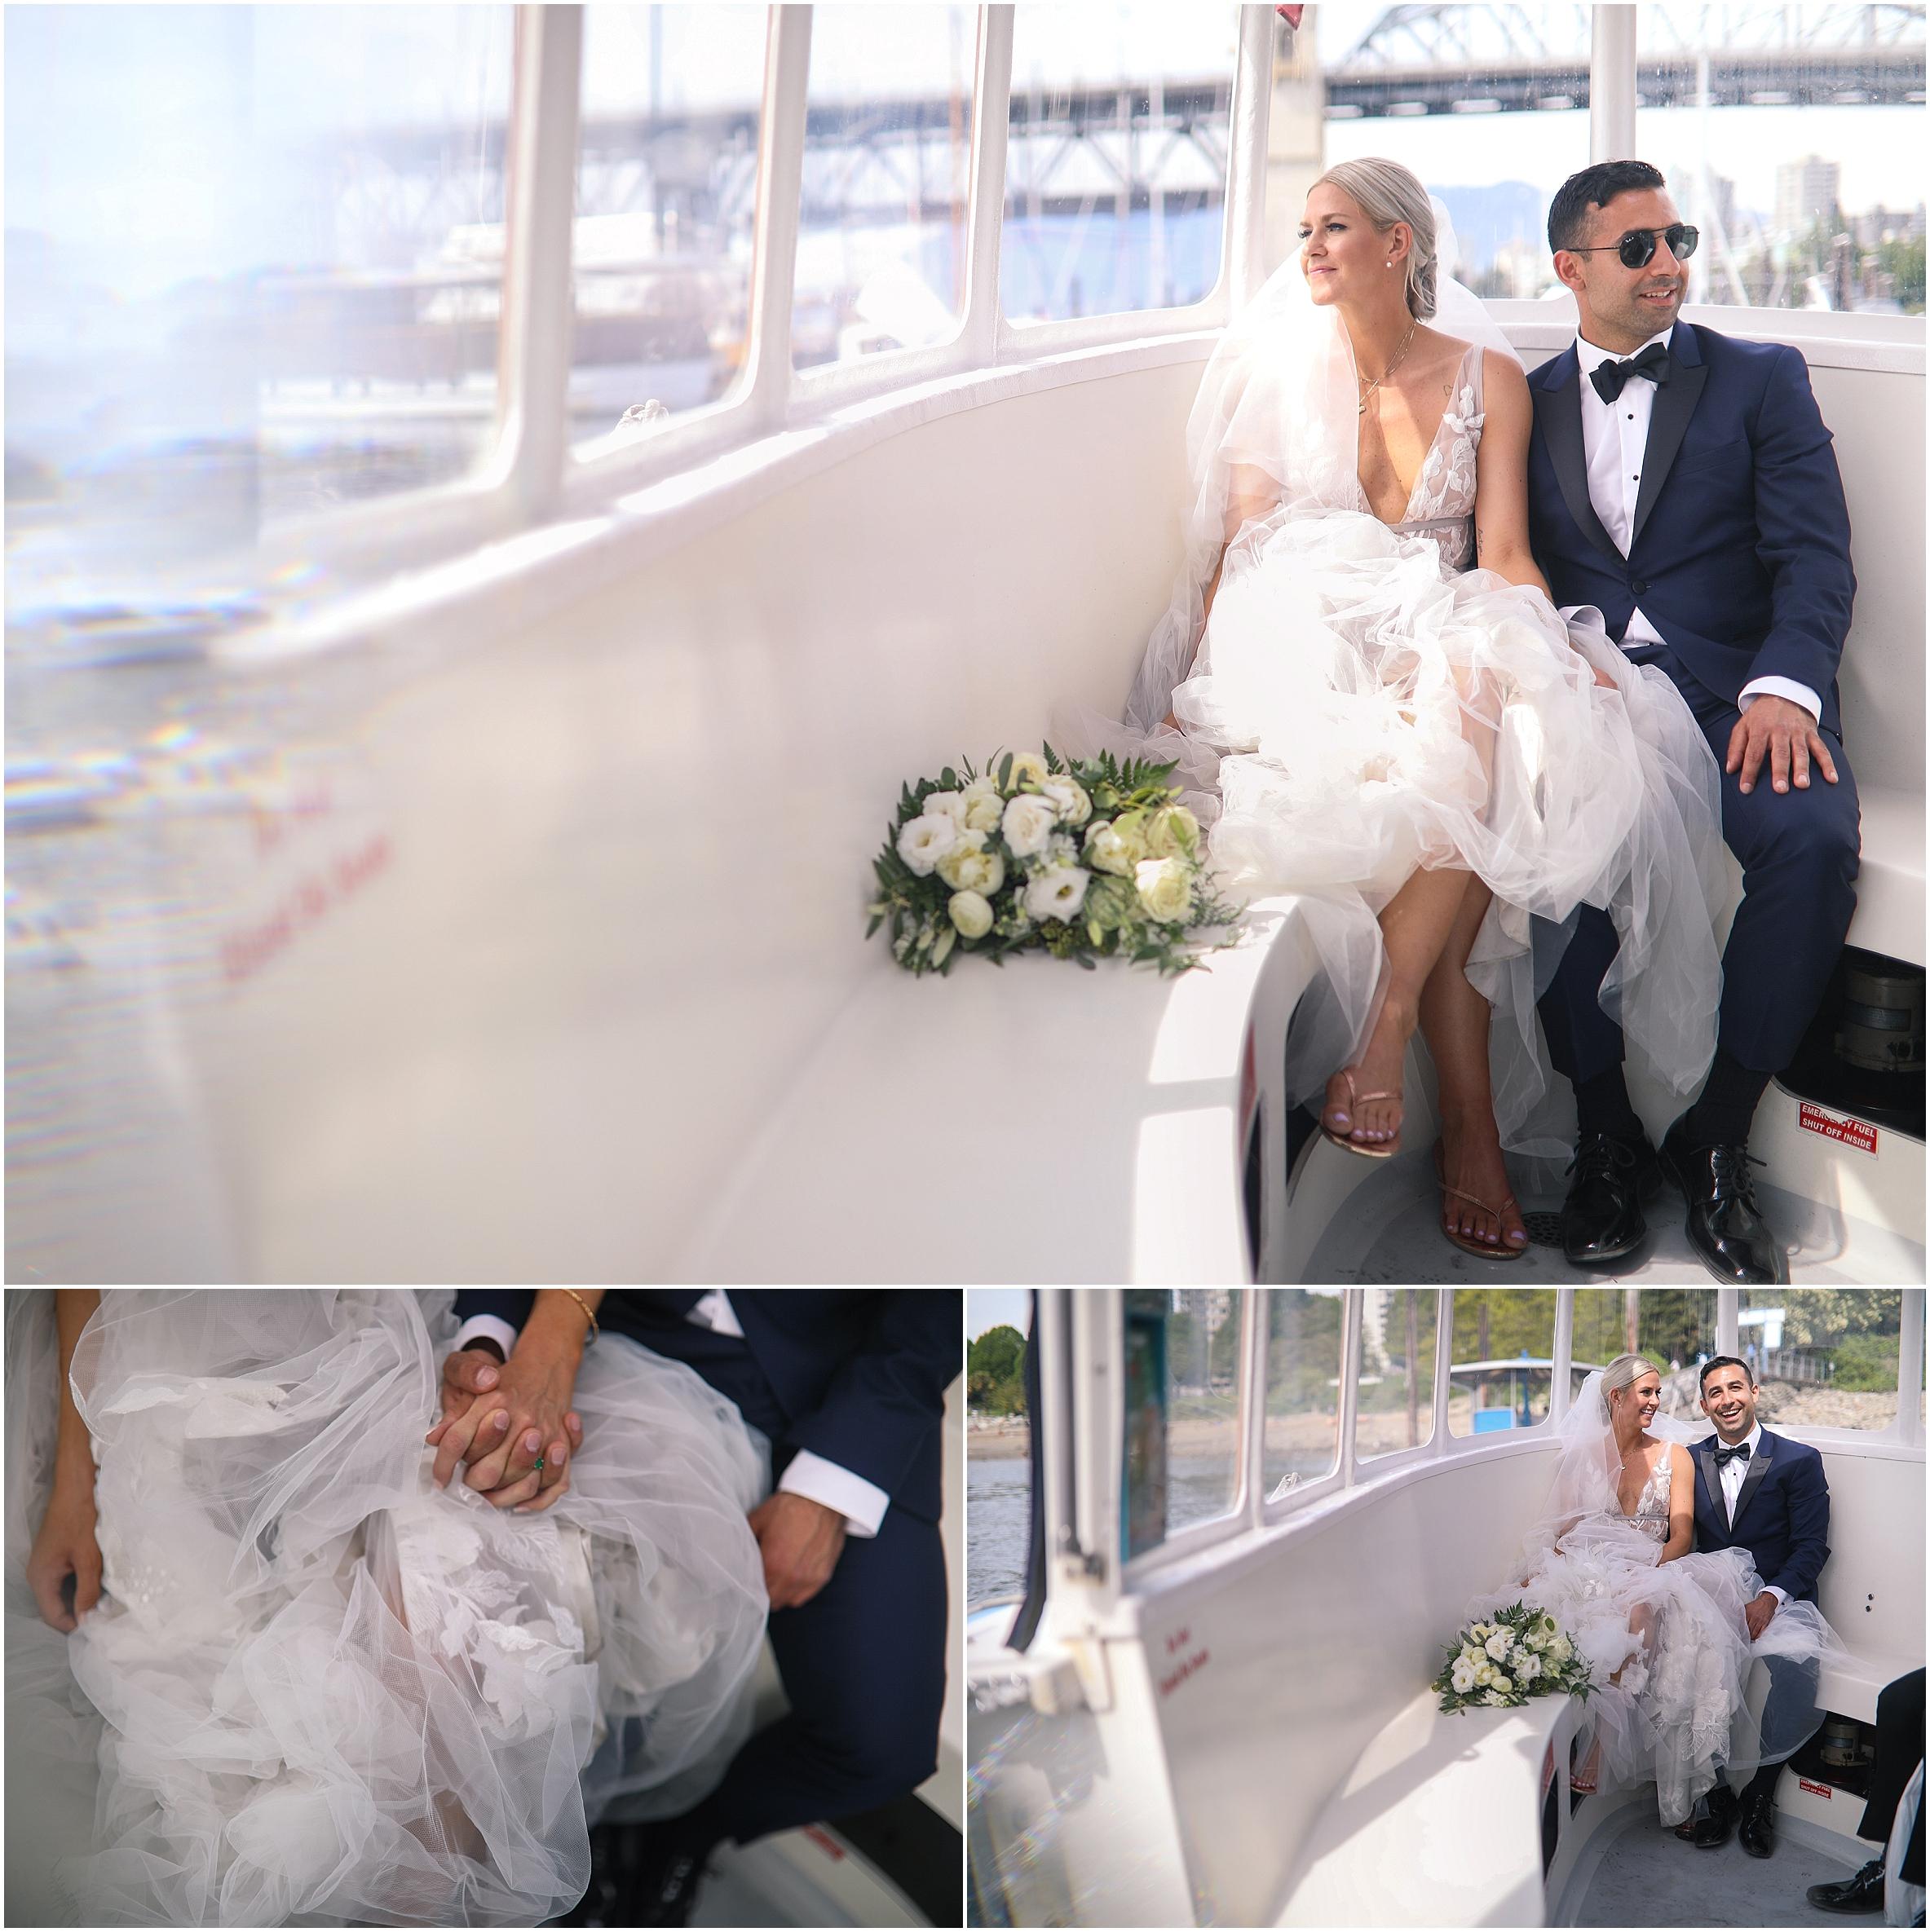 vancouver-wedding-photographer-the-loft-earls-yaletown_0014.jpg